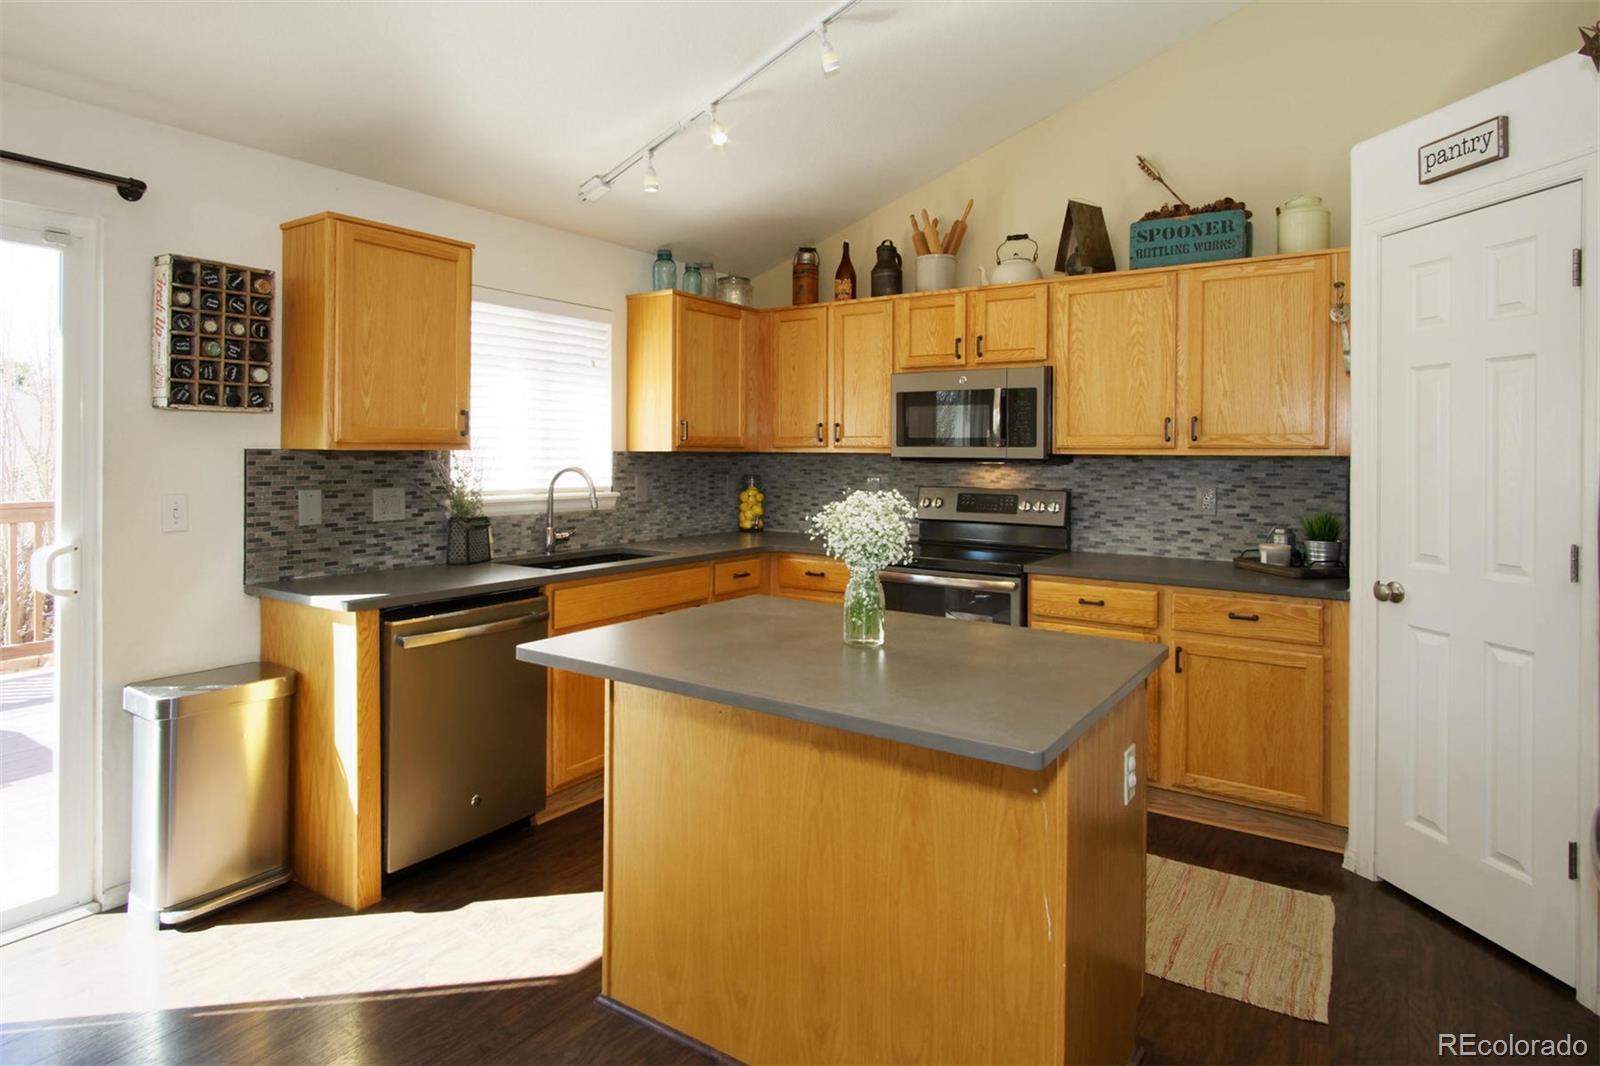 MLS# 1588259 - 6 - 11326 W Crestline Drive, Littleton, CO 80127